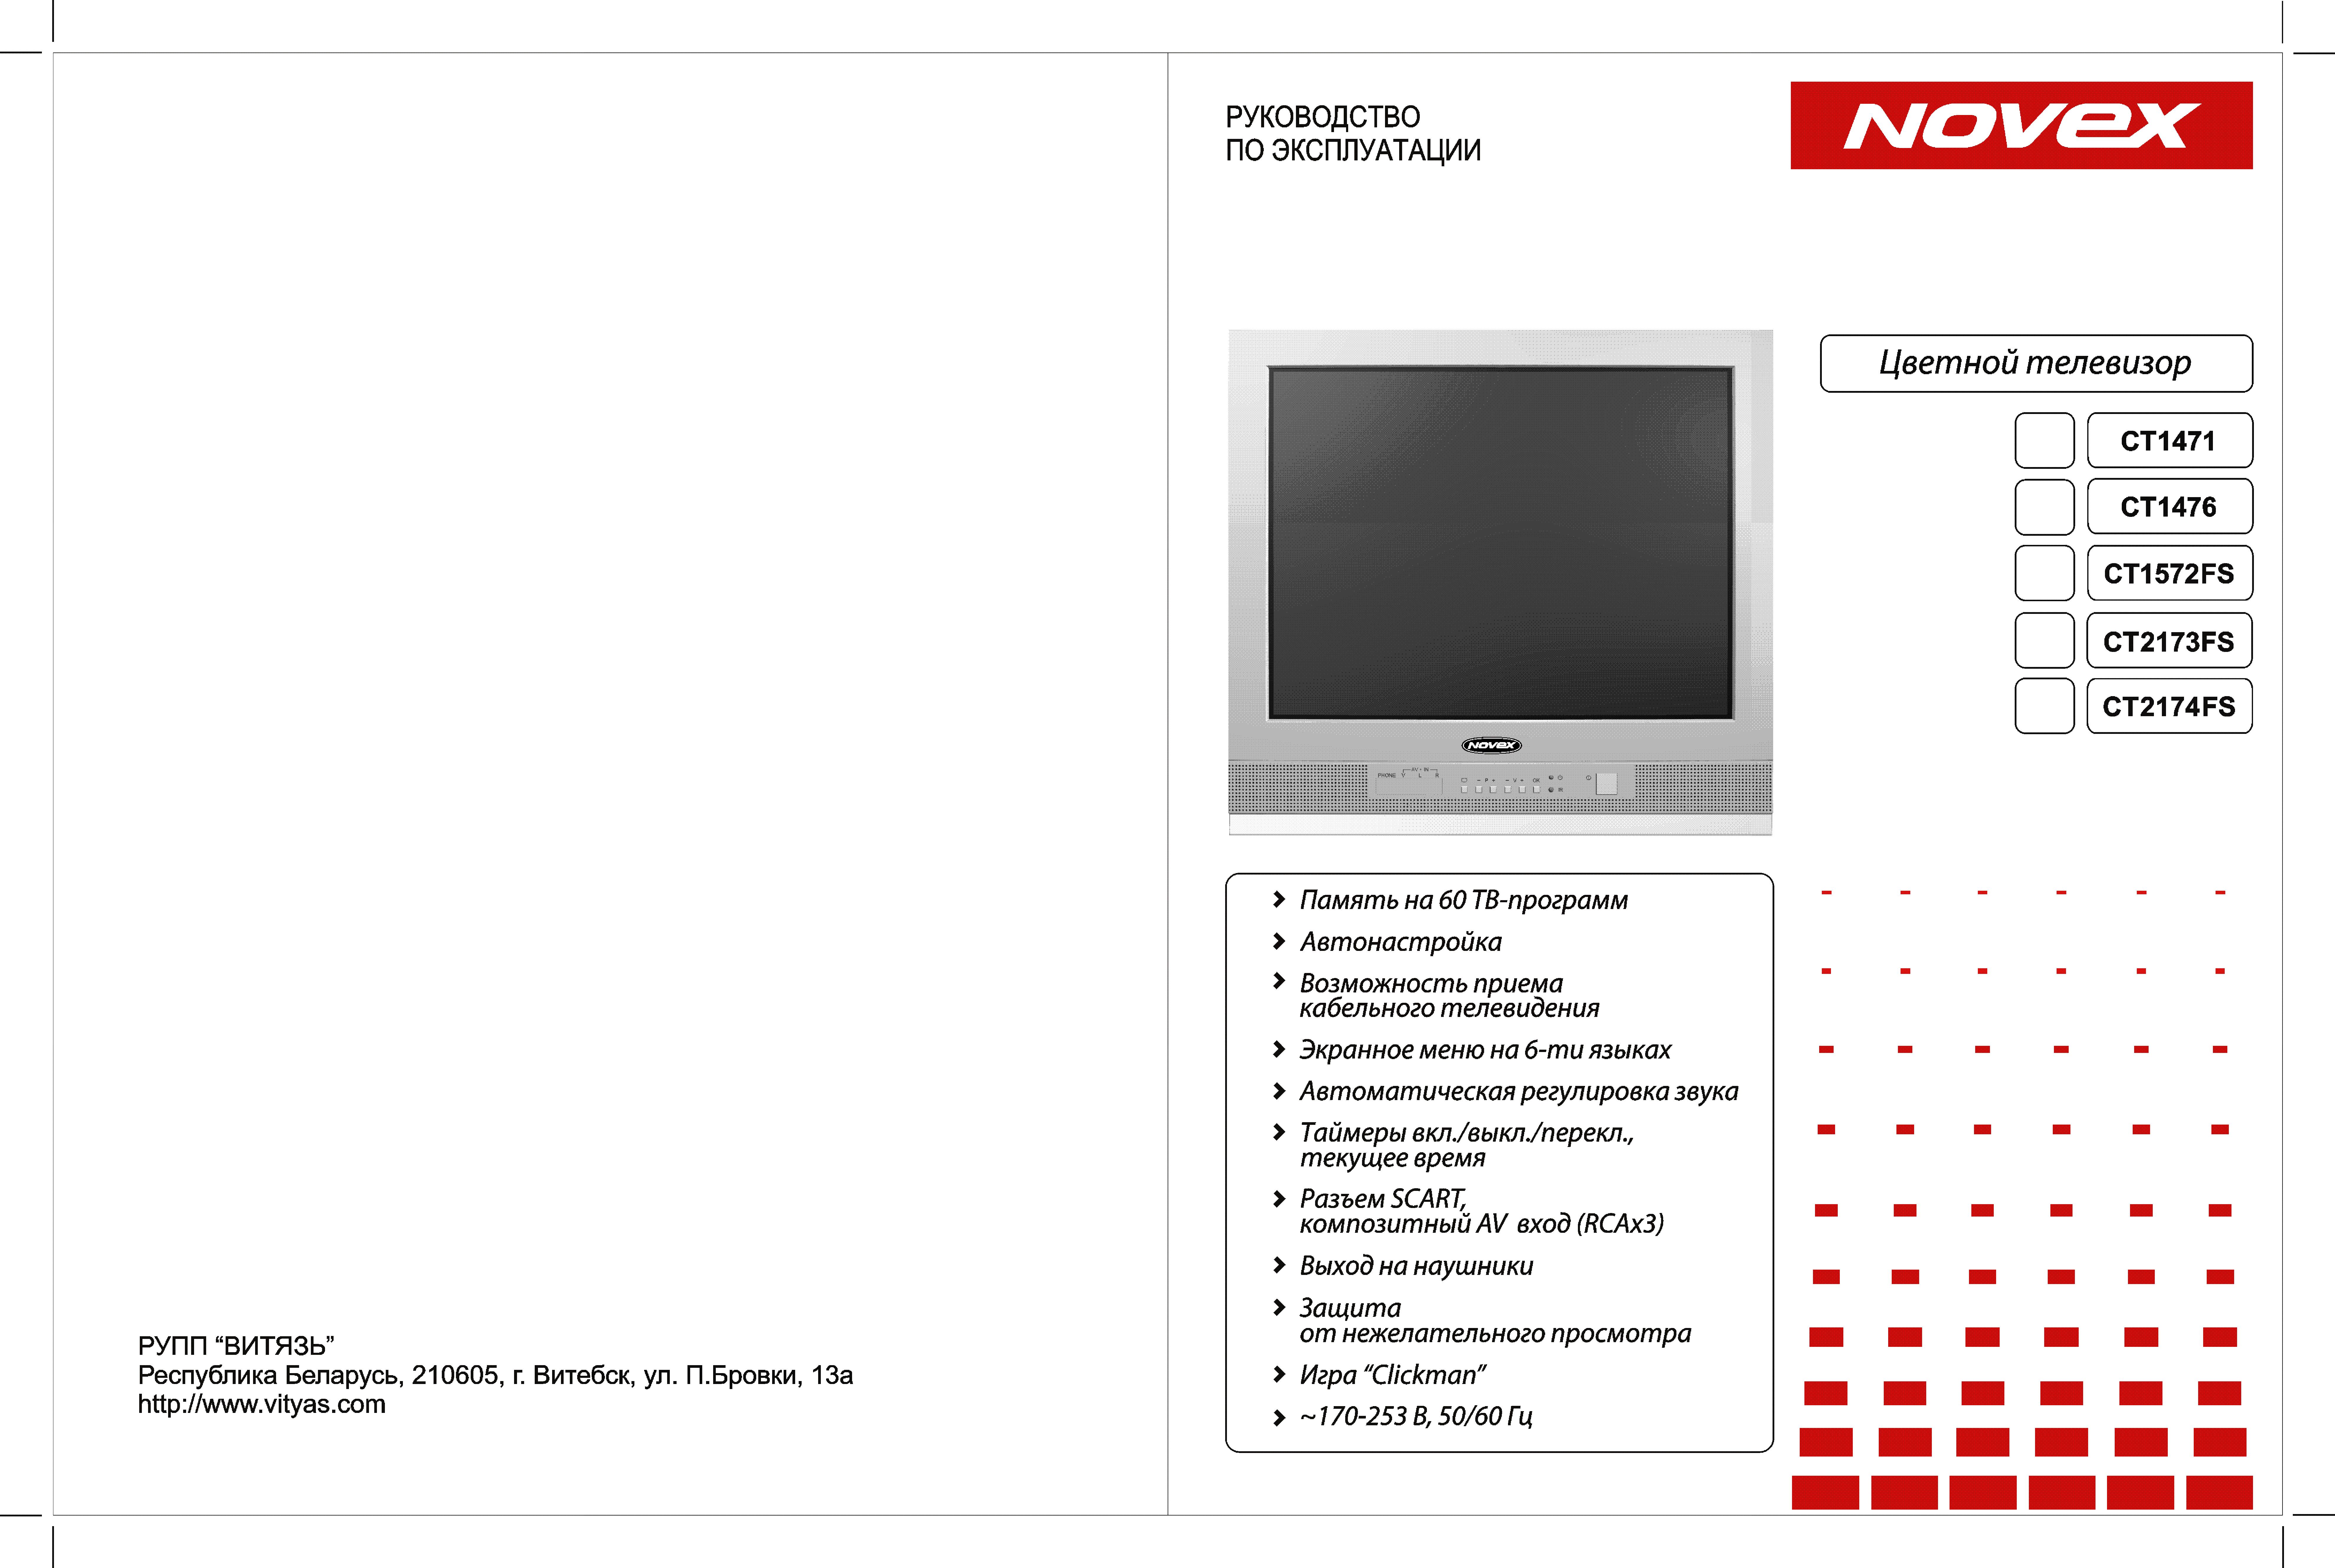 схема телевизора новекс модель ст1471